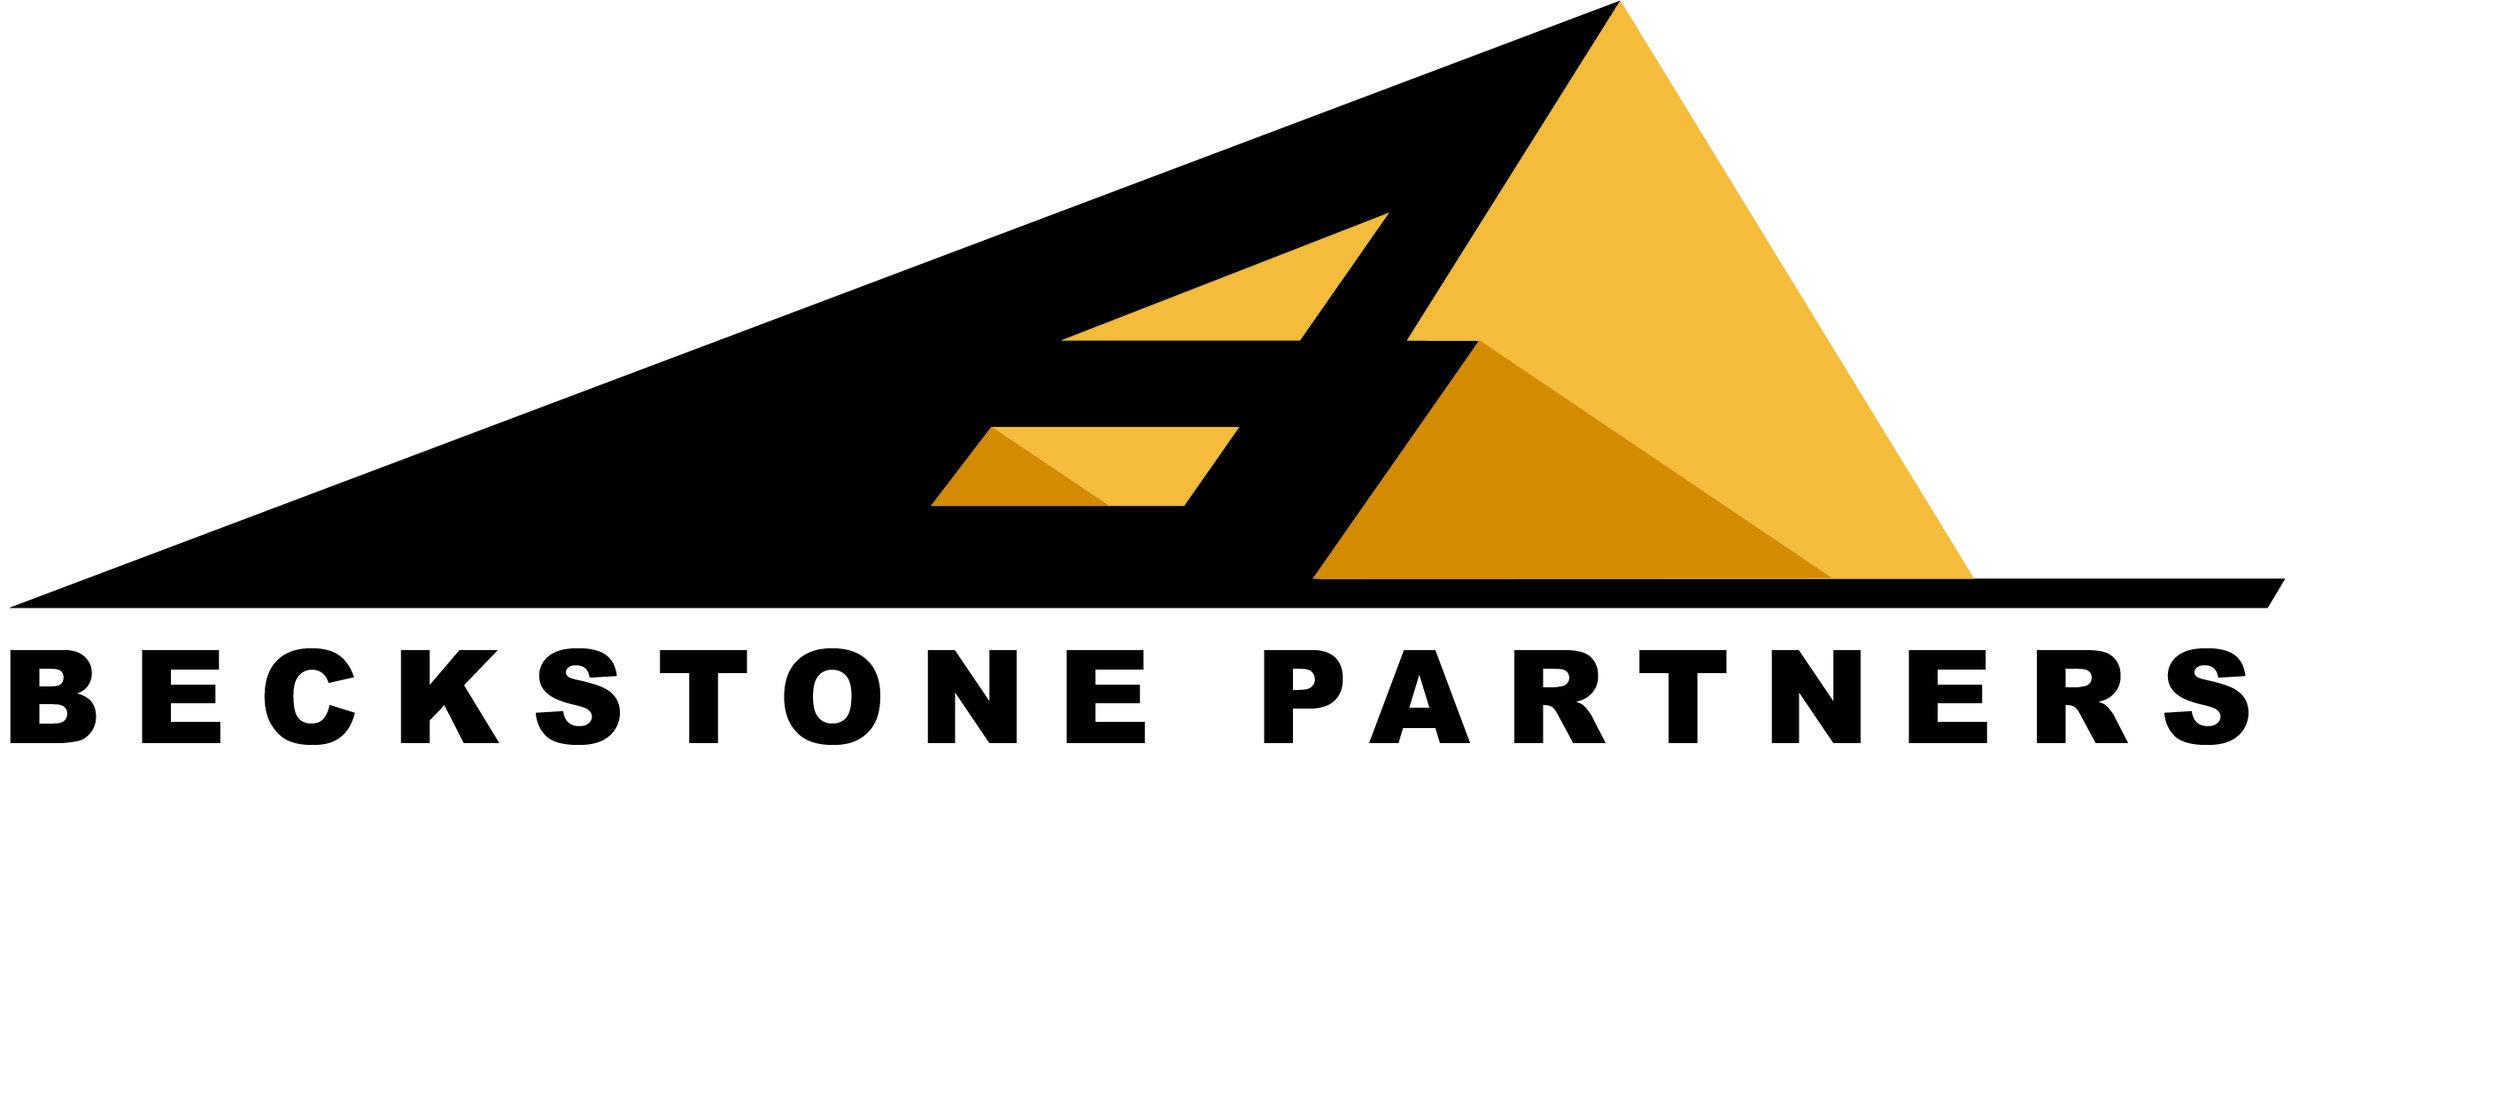 Beckstone Partners Color Logo.jpg